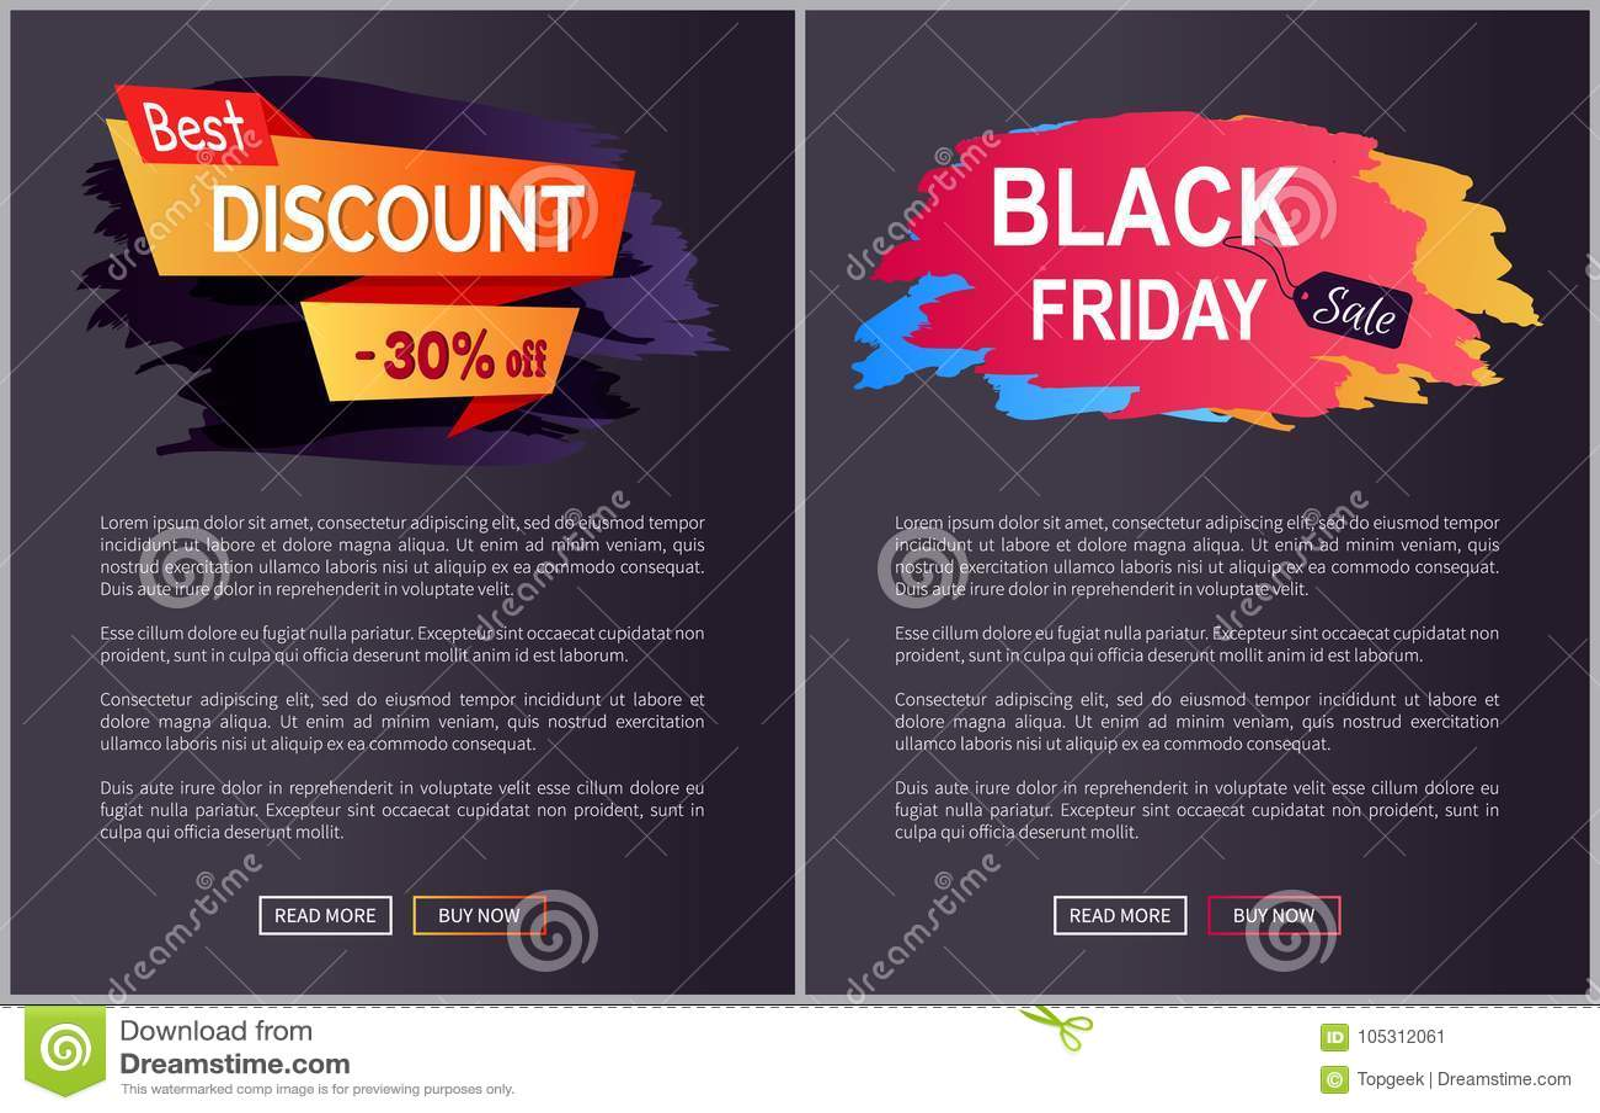 Best Discount 30 Black Friday Vector Illustration Stock Vector Illustration Of Background Marketing 105312061